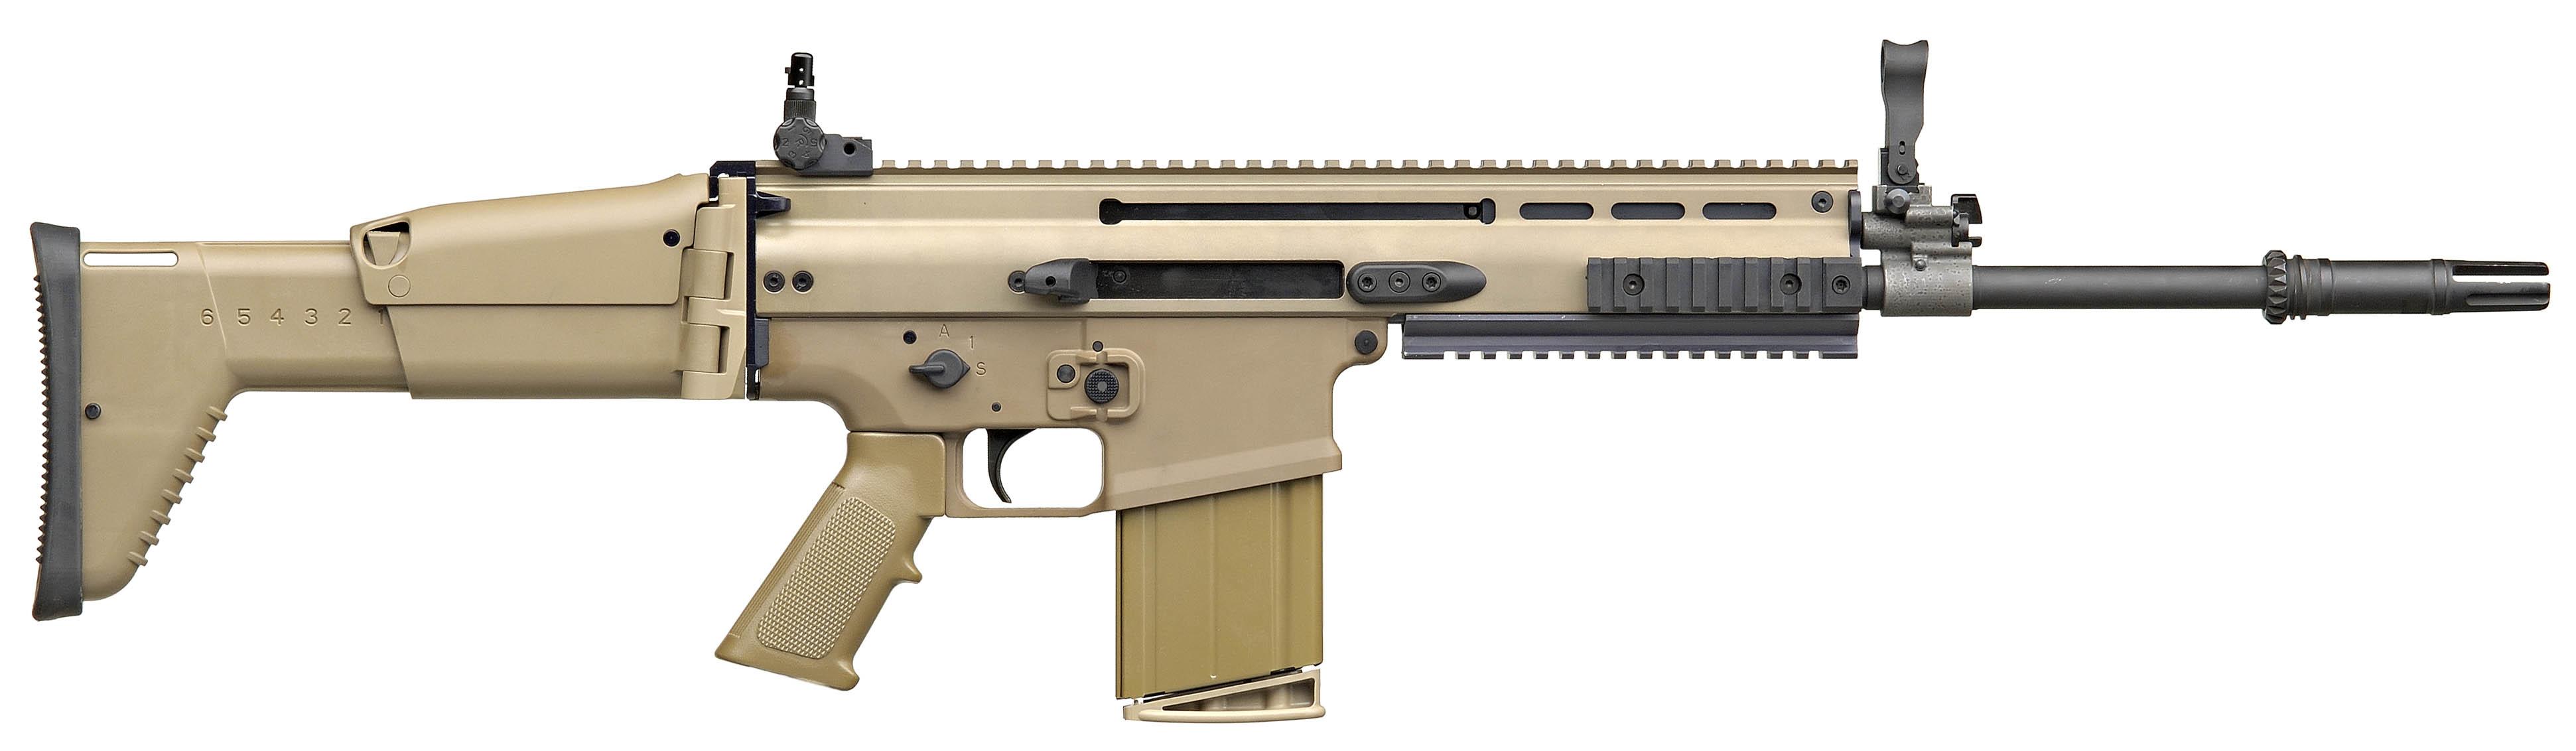 FN_SCAR-H_(Standard).jpg